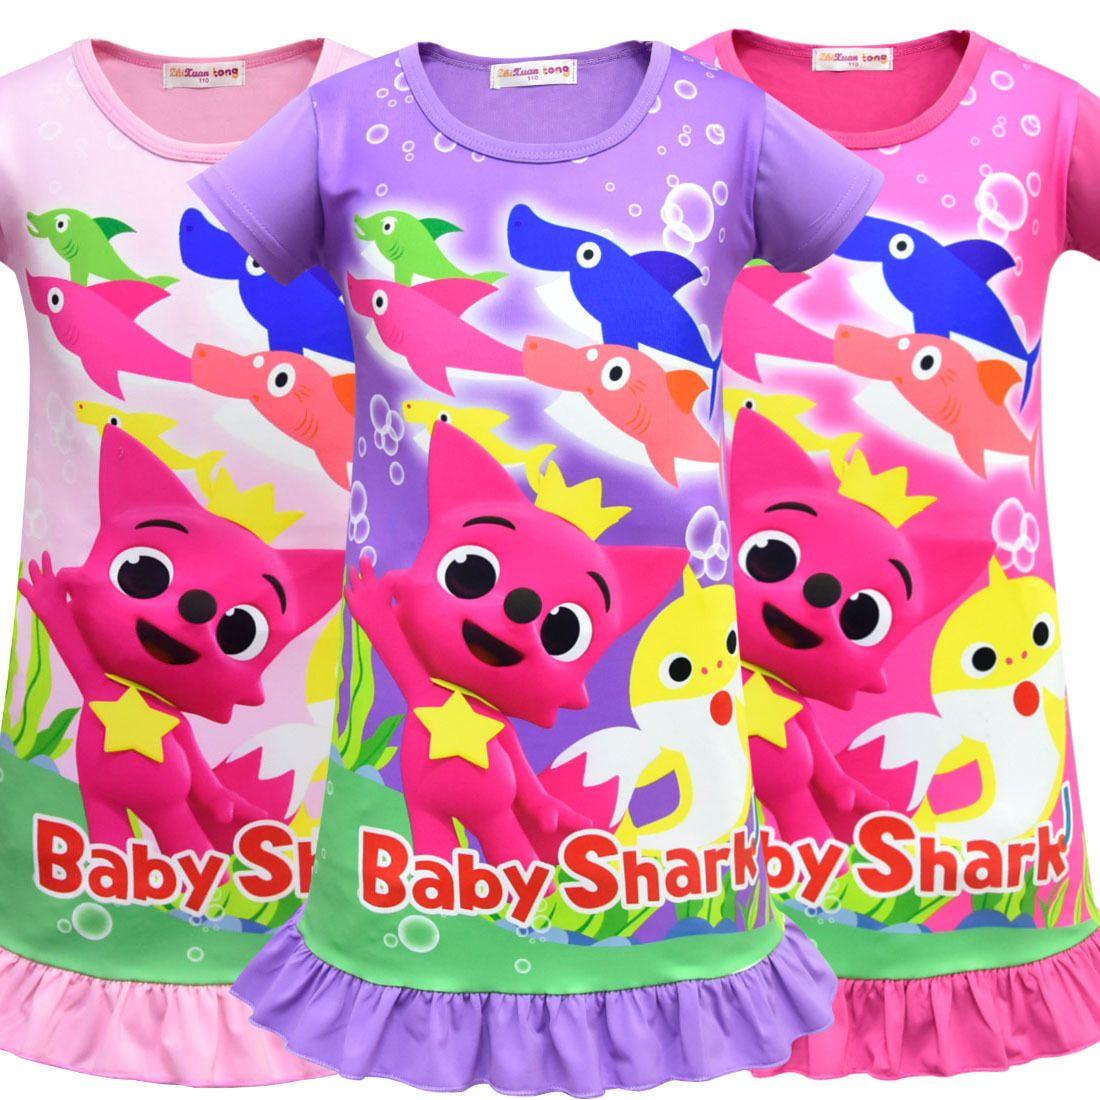 efa15954 Acquista Ragazze Baby Shark Dress Clothes Lovely Children Manica Corta  Cartoon Pinkfong Pigiama Dress Shark Stampa Vestiti Infantili Baby Sumer  Night Skirt ...